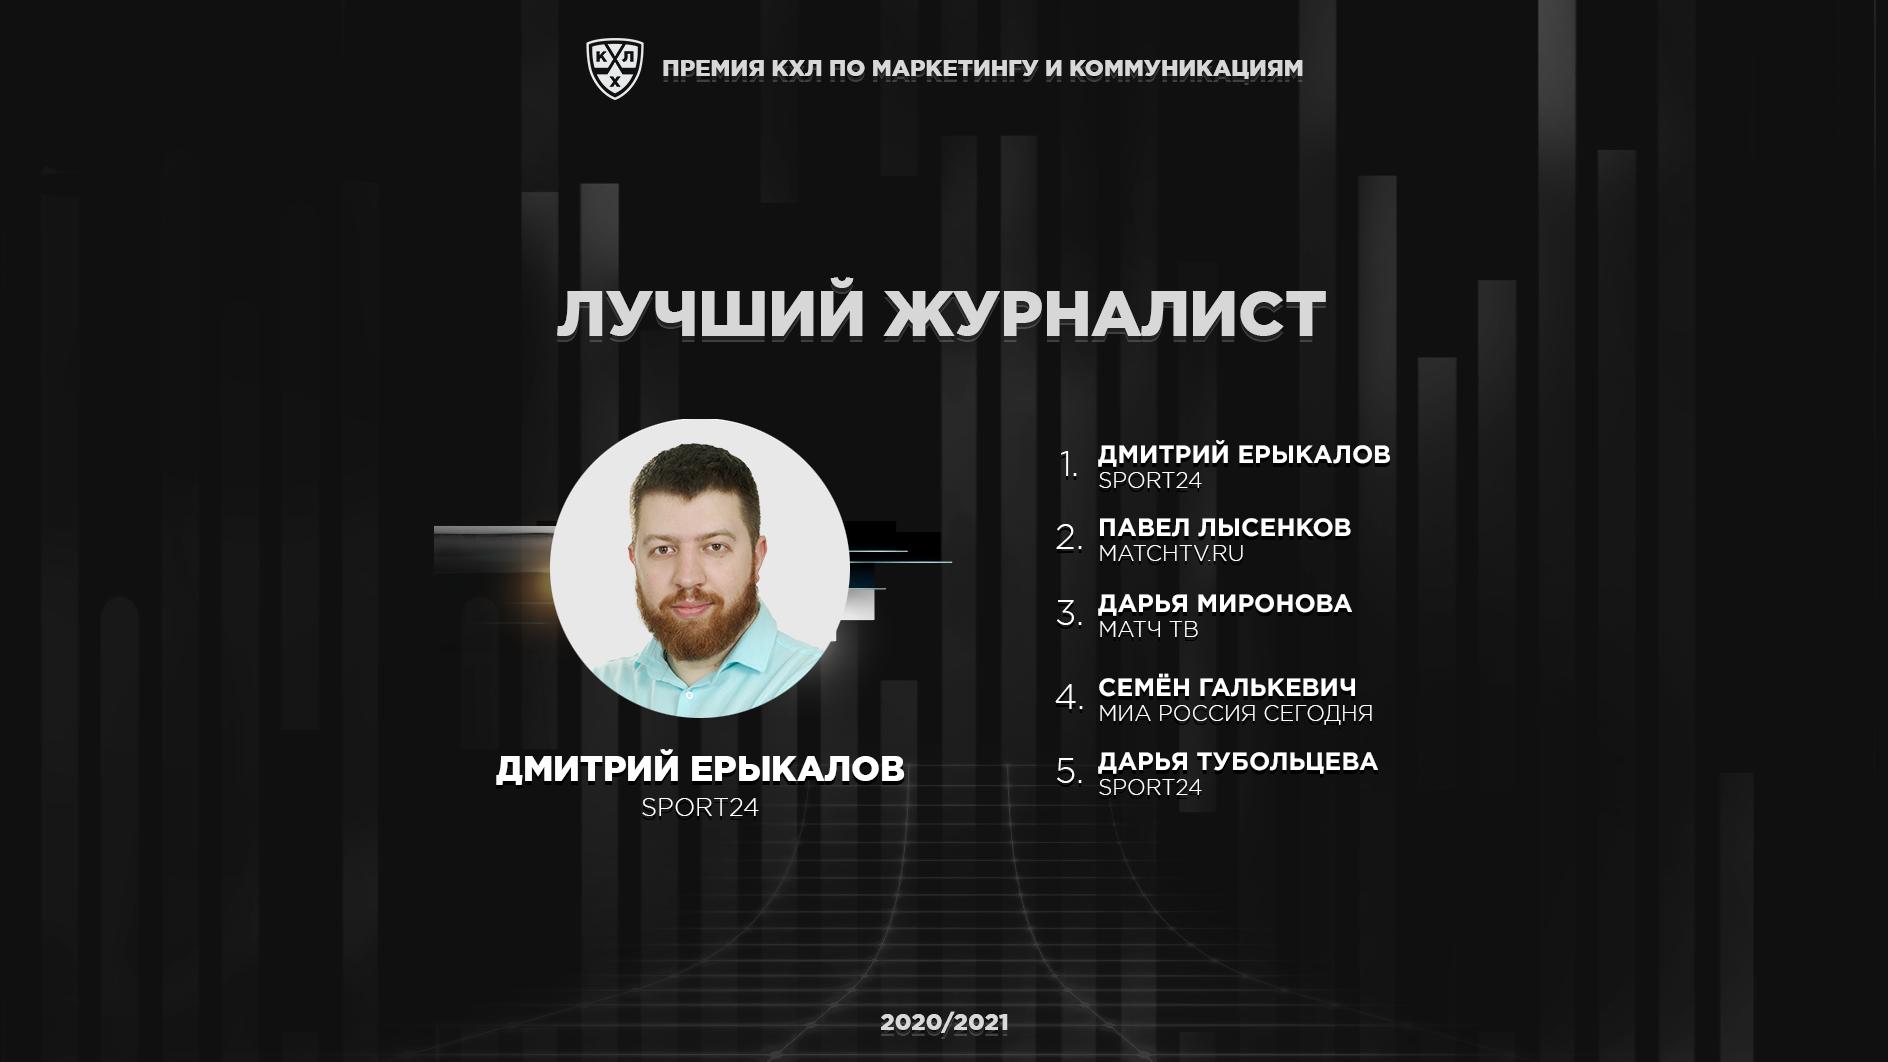 Presentation_Лучший журналист.jpg